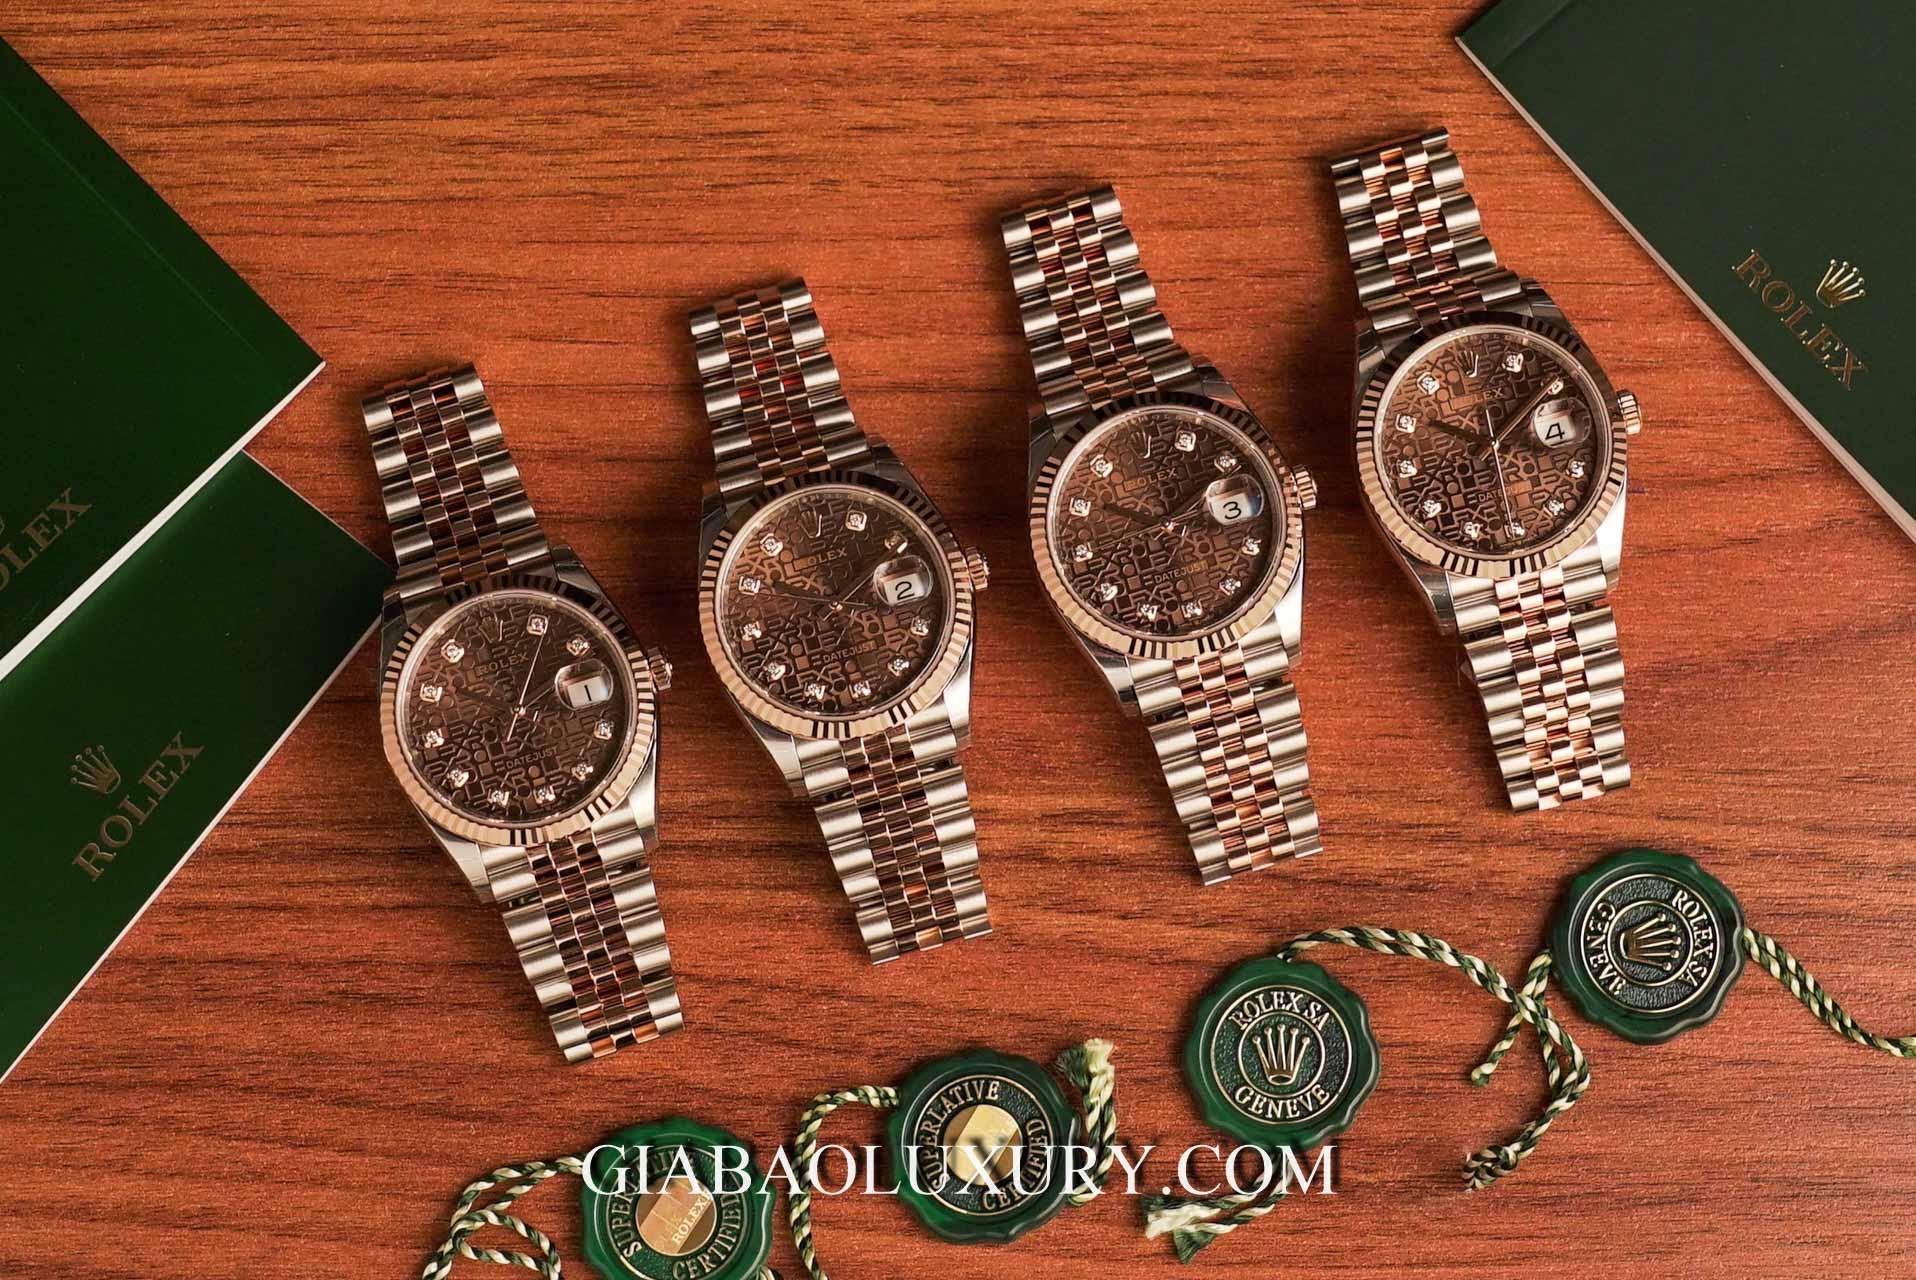 Đồng Hồ Rolex Datejust 126231 Mặt Số Vi Tính Chocolate